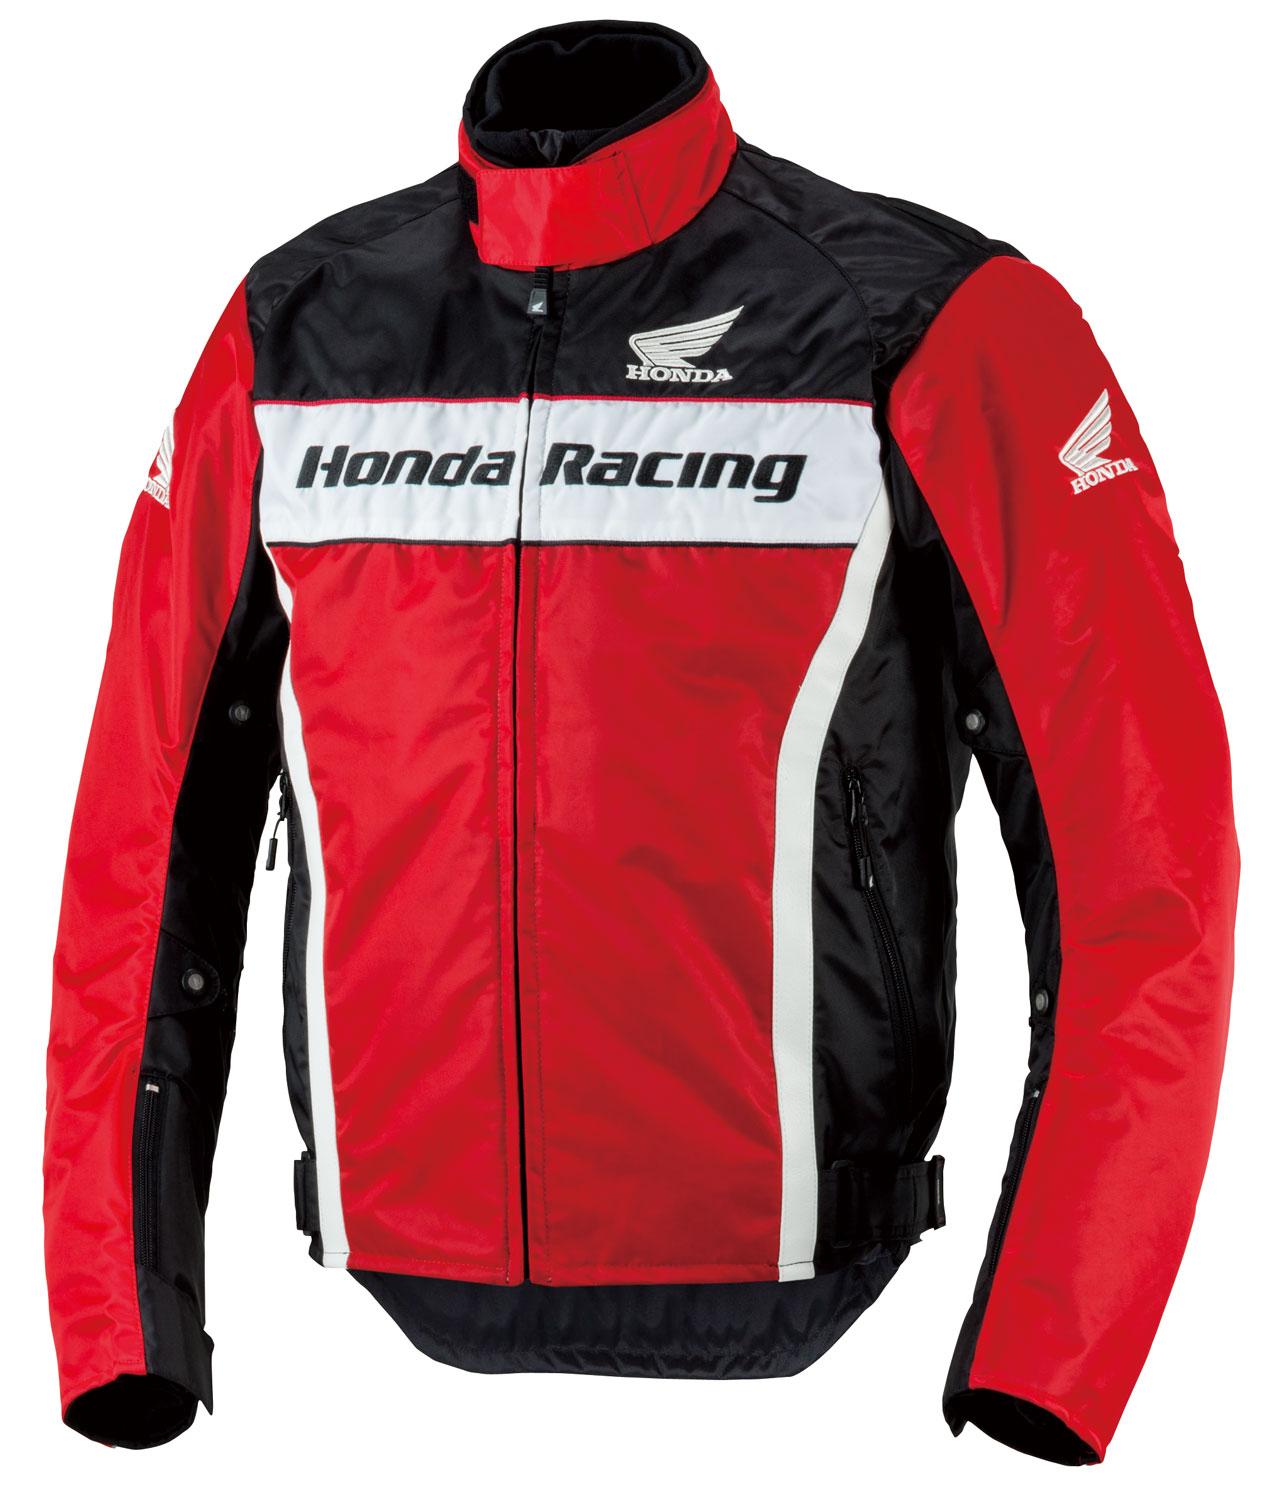 Honda Riding Gear >> Honda Riding Gear Winter Graphic Blouson 0sytn W3p Rs